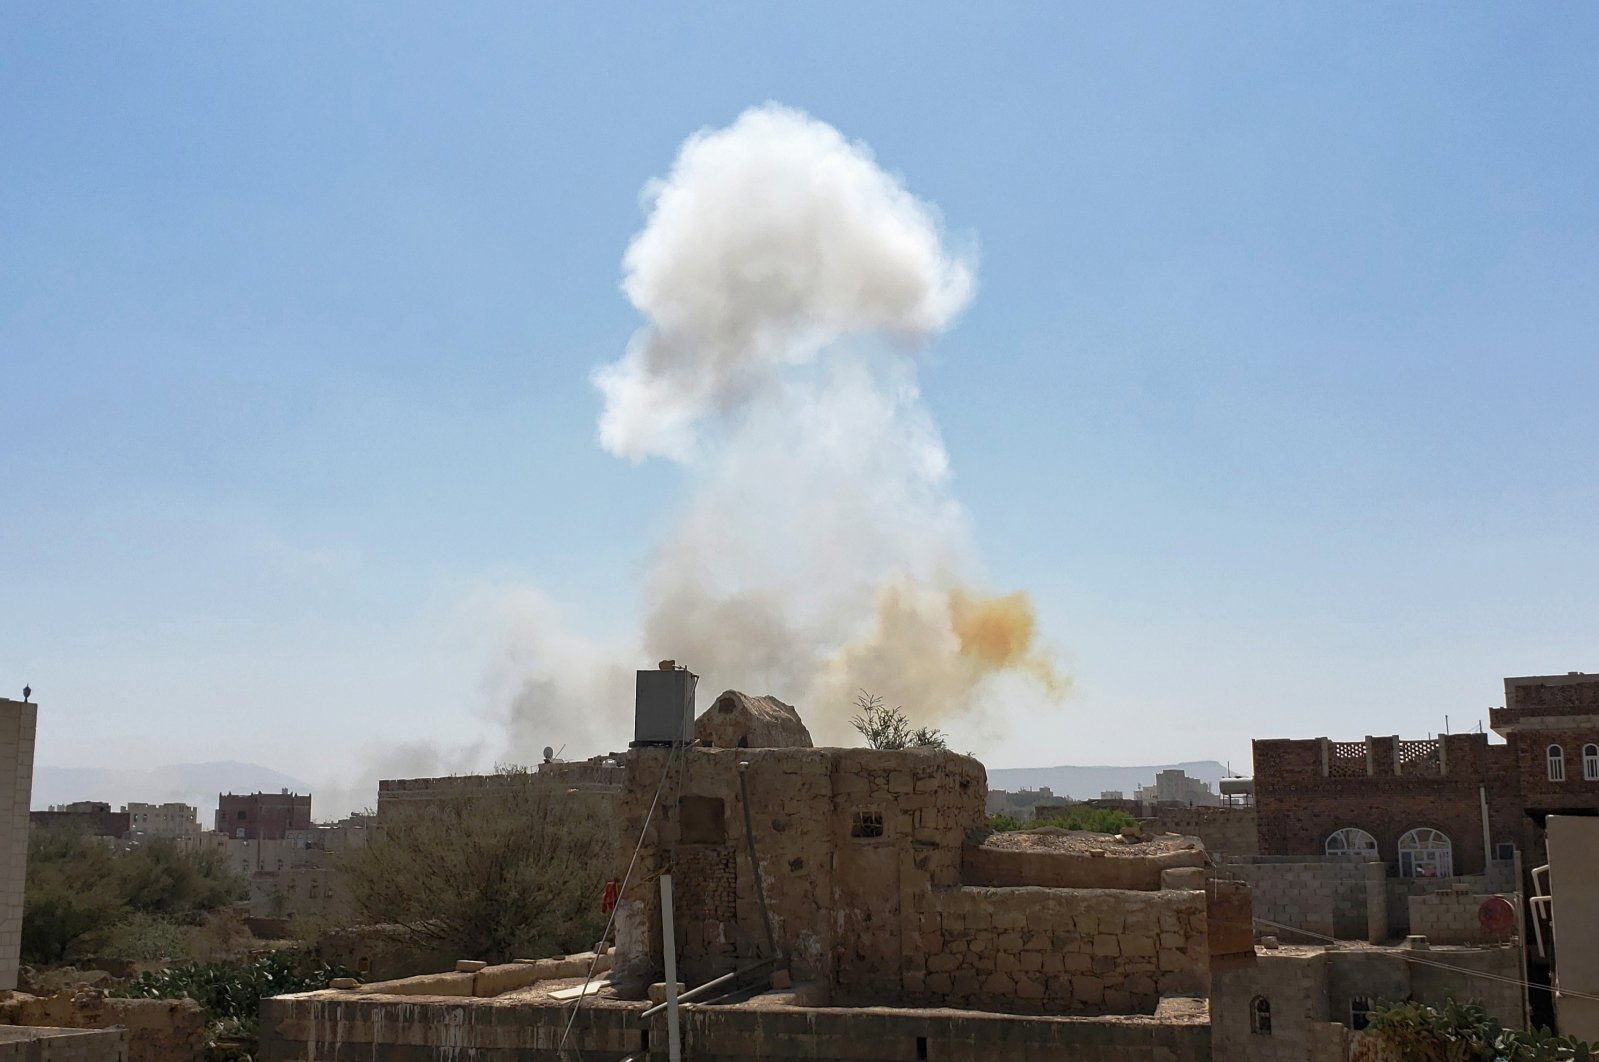 Smoke rises after Saudi-led airstrikes on an army base in Sanaa, Yemen, March 7, 2021. (AP Photo)